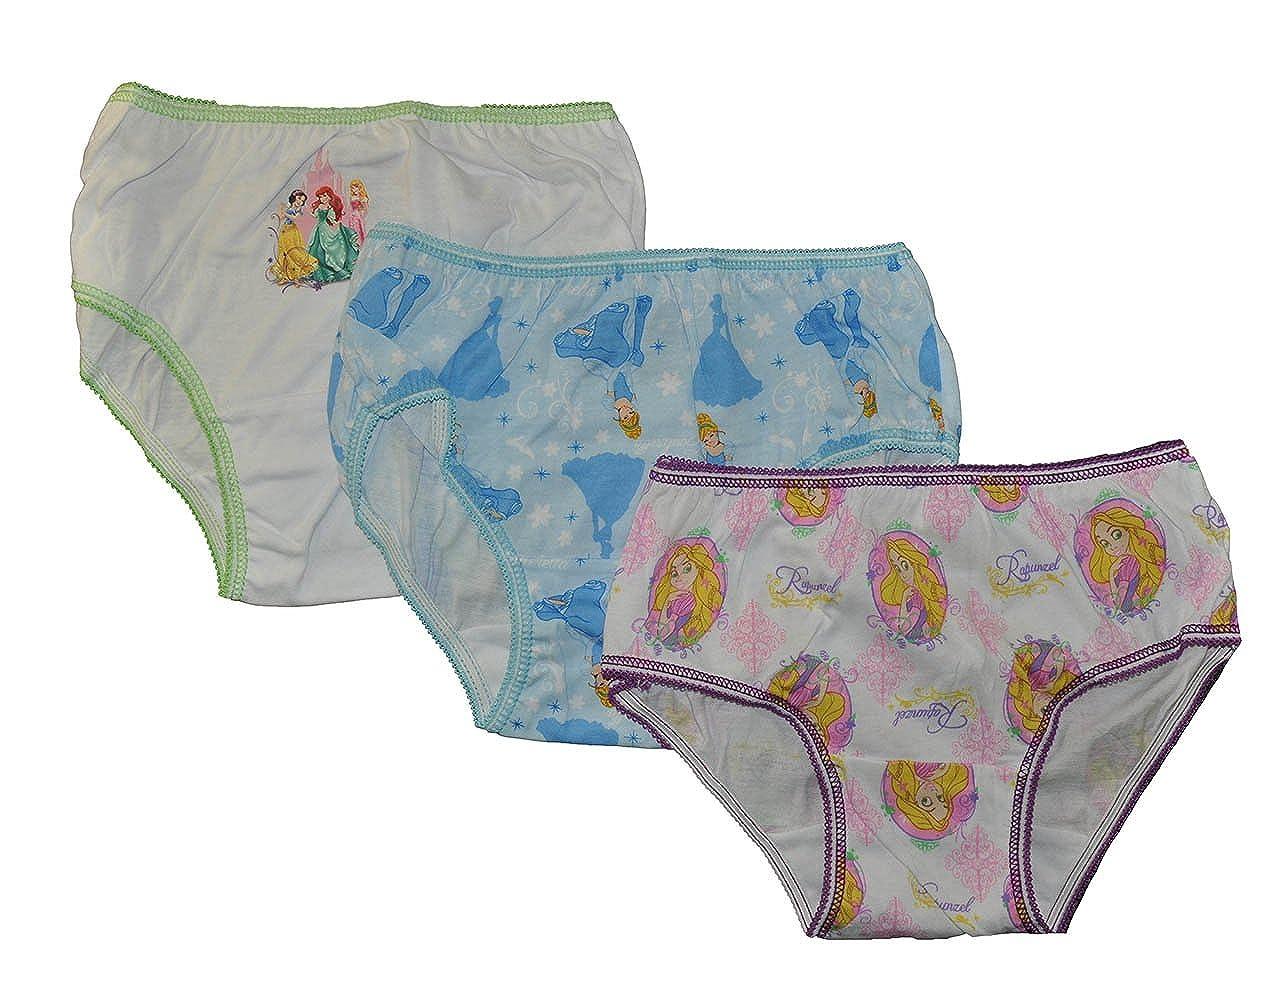 Disney Princess Little Girls 3 Pack Panties